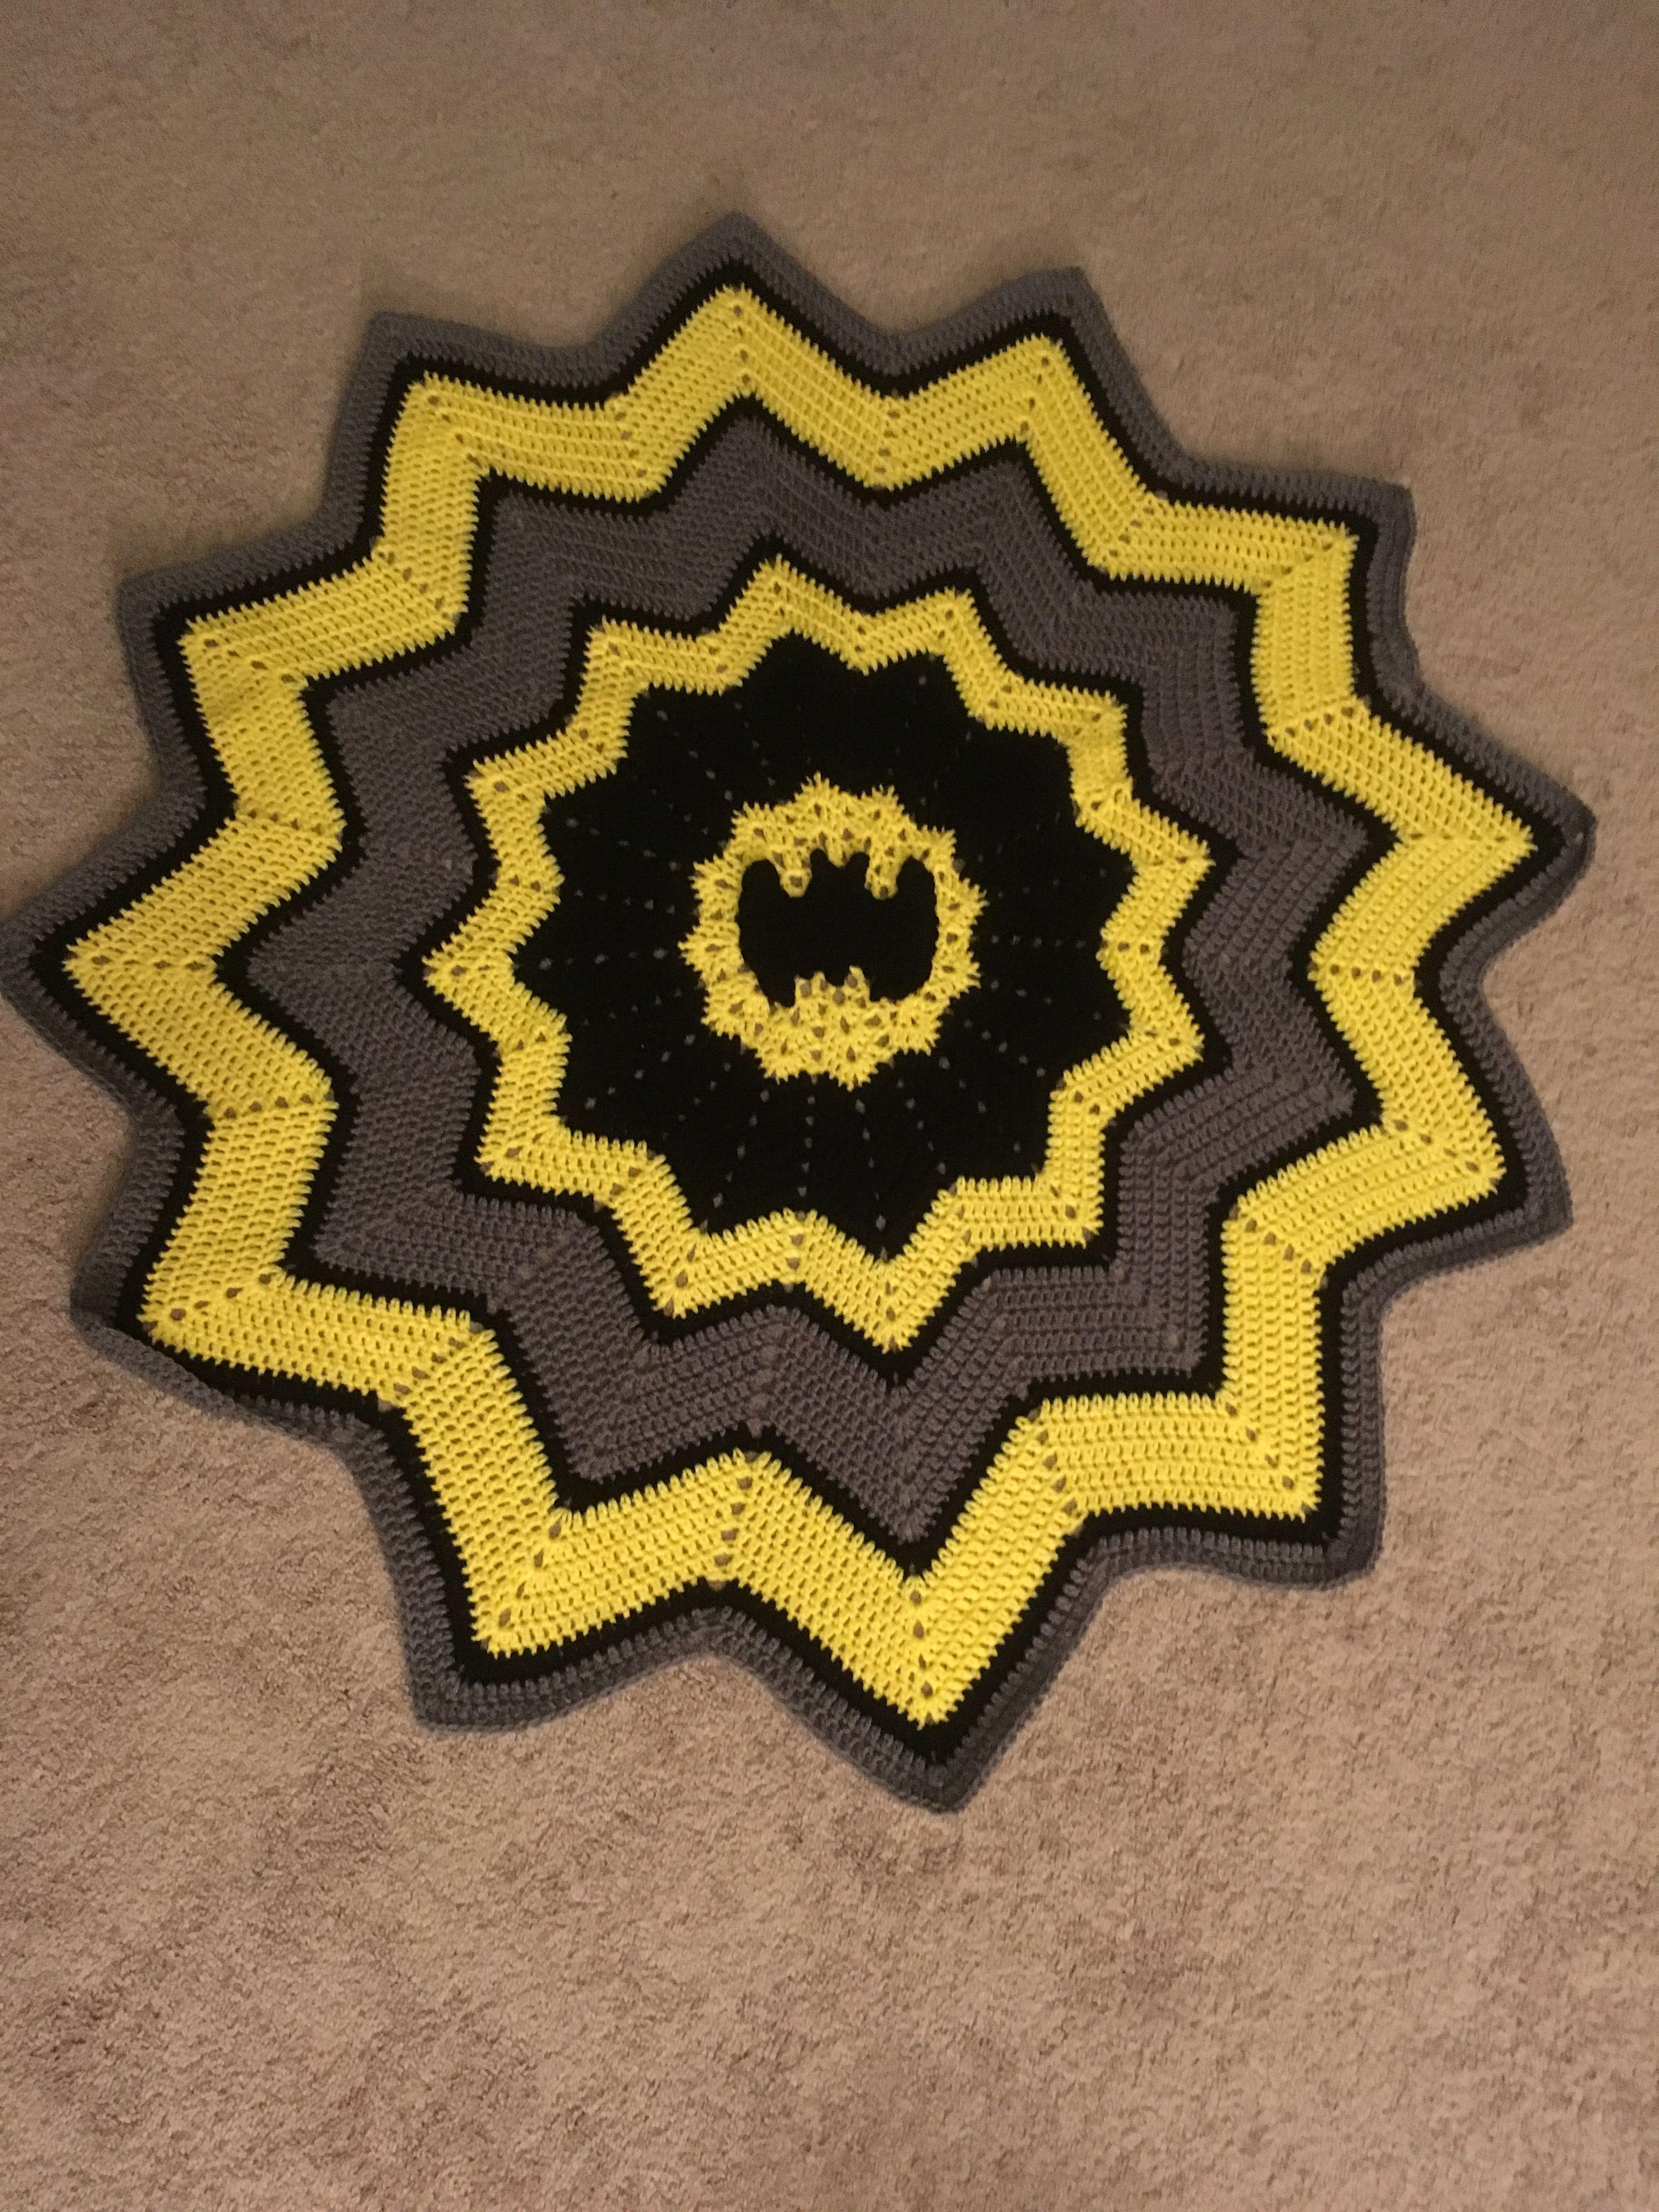 Crochet batman round ripple blanket crochet blankets pinterest crochet batman round ripple blanket bankloansurffo Images